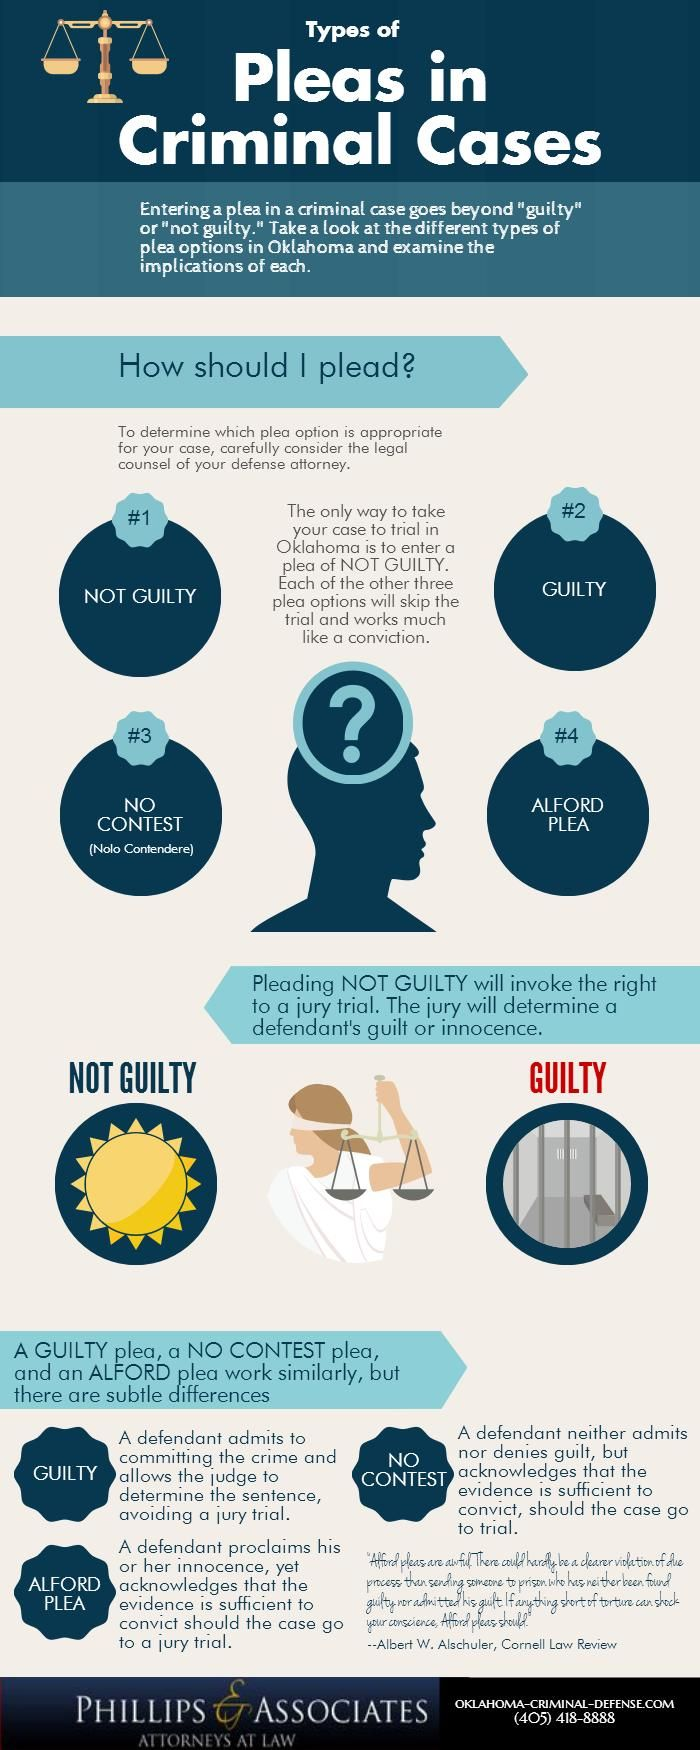 Criminal Justice Careers